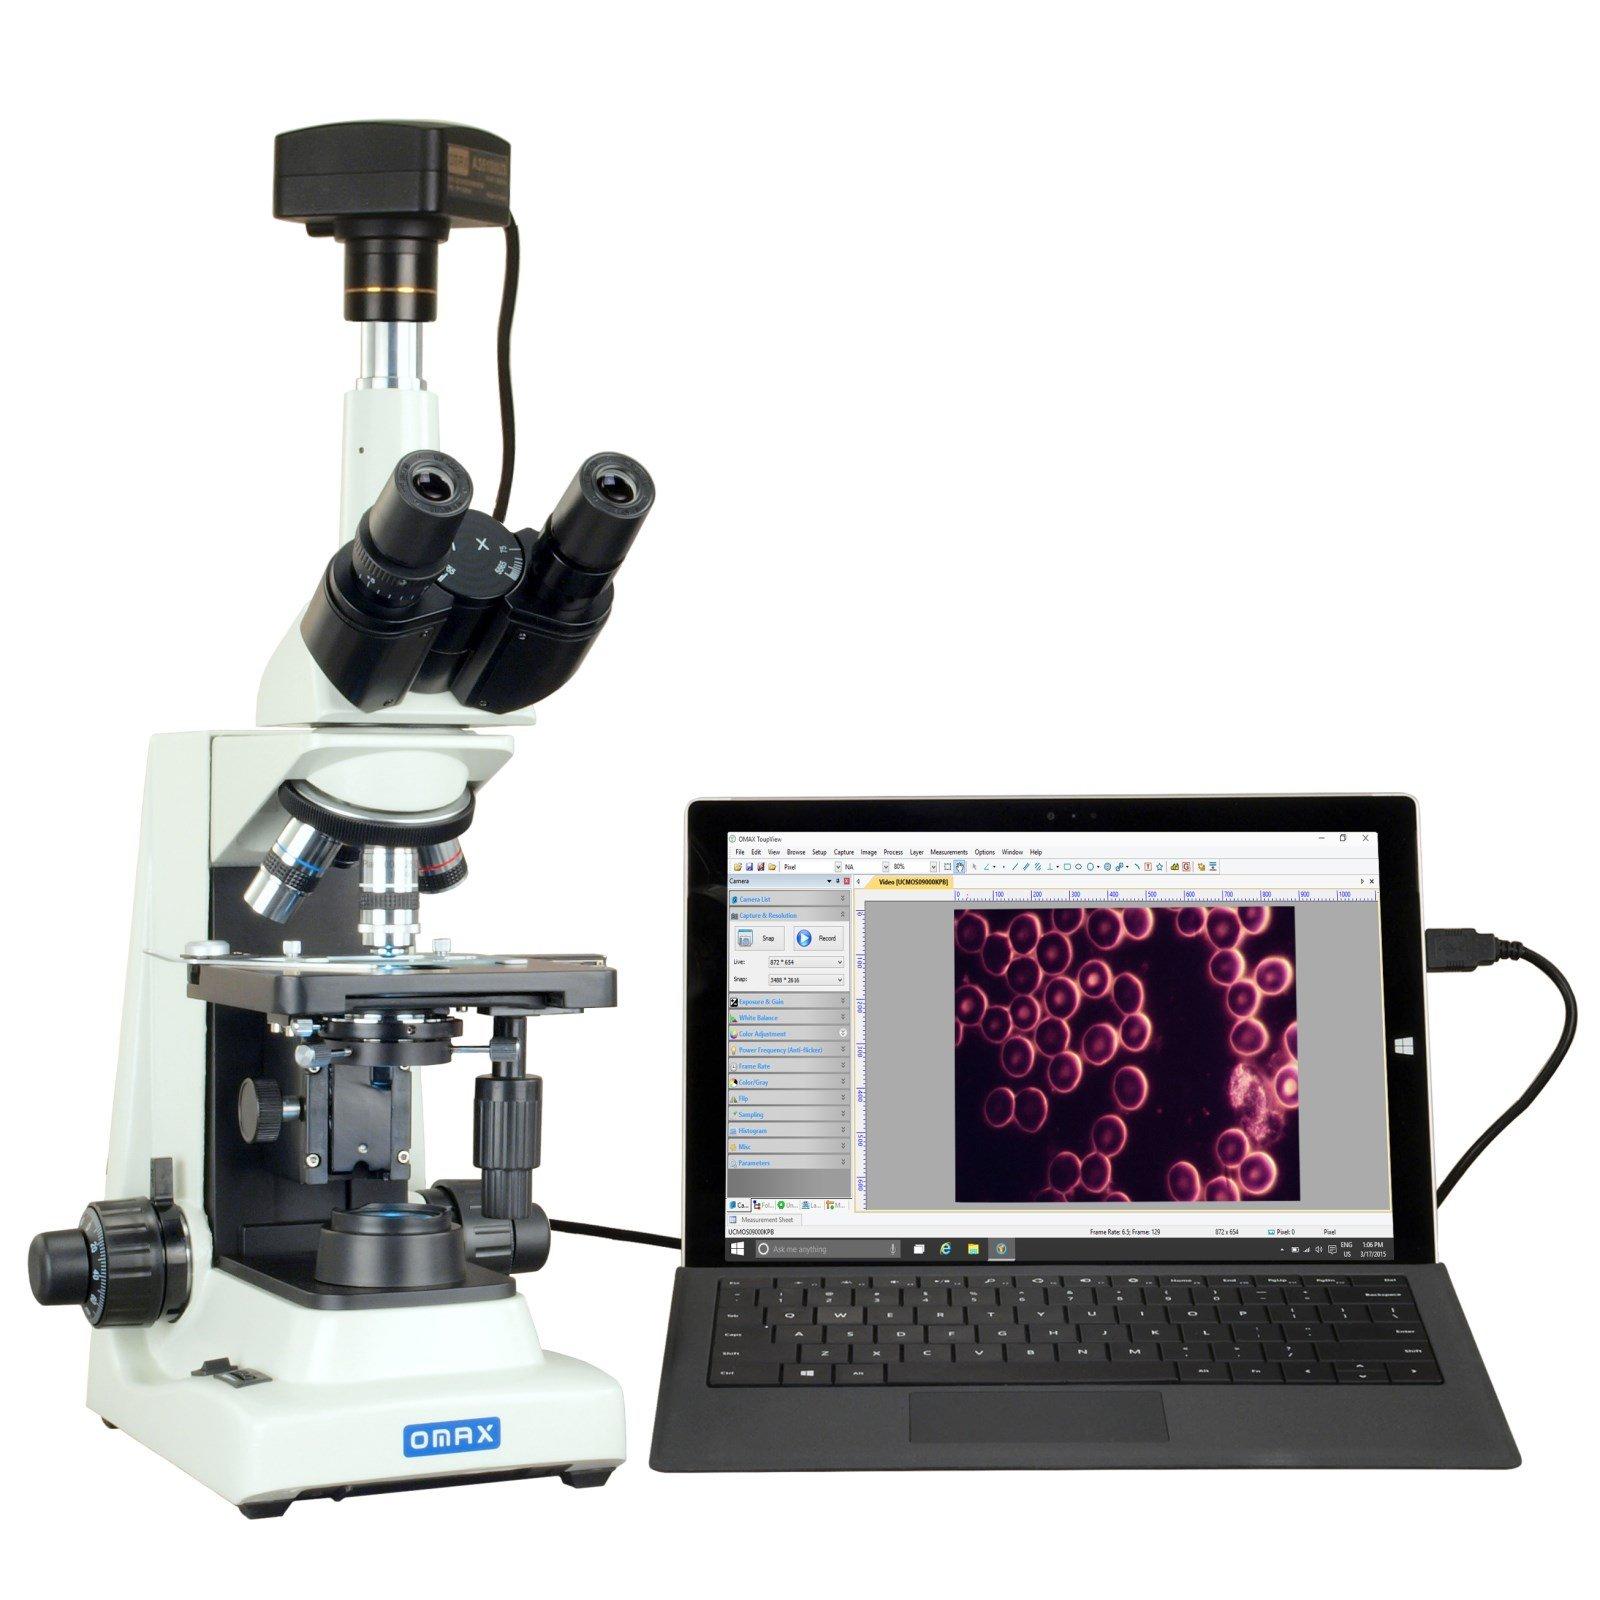 OMAX 40X-2000X USB3 18MP Plan Trinocular Darkfield Super Bright LED Lab Microscope for Live Blood by OMAX